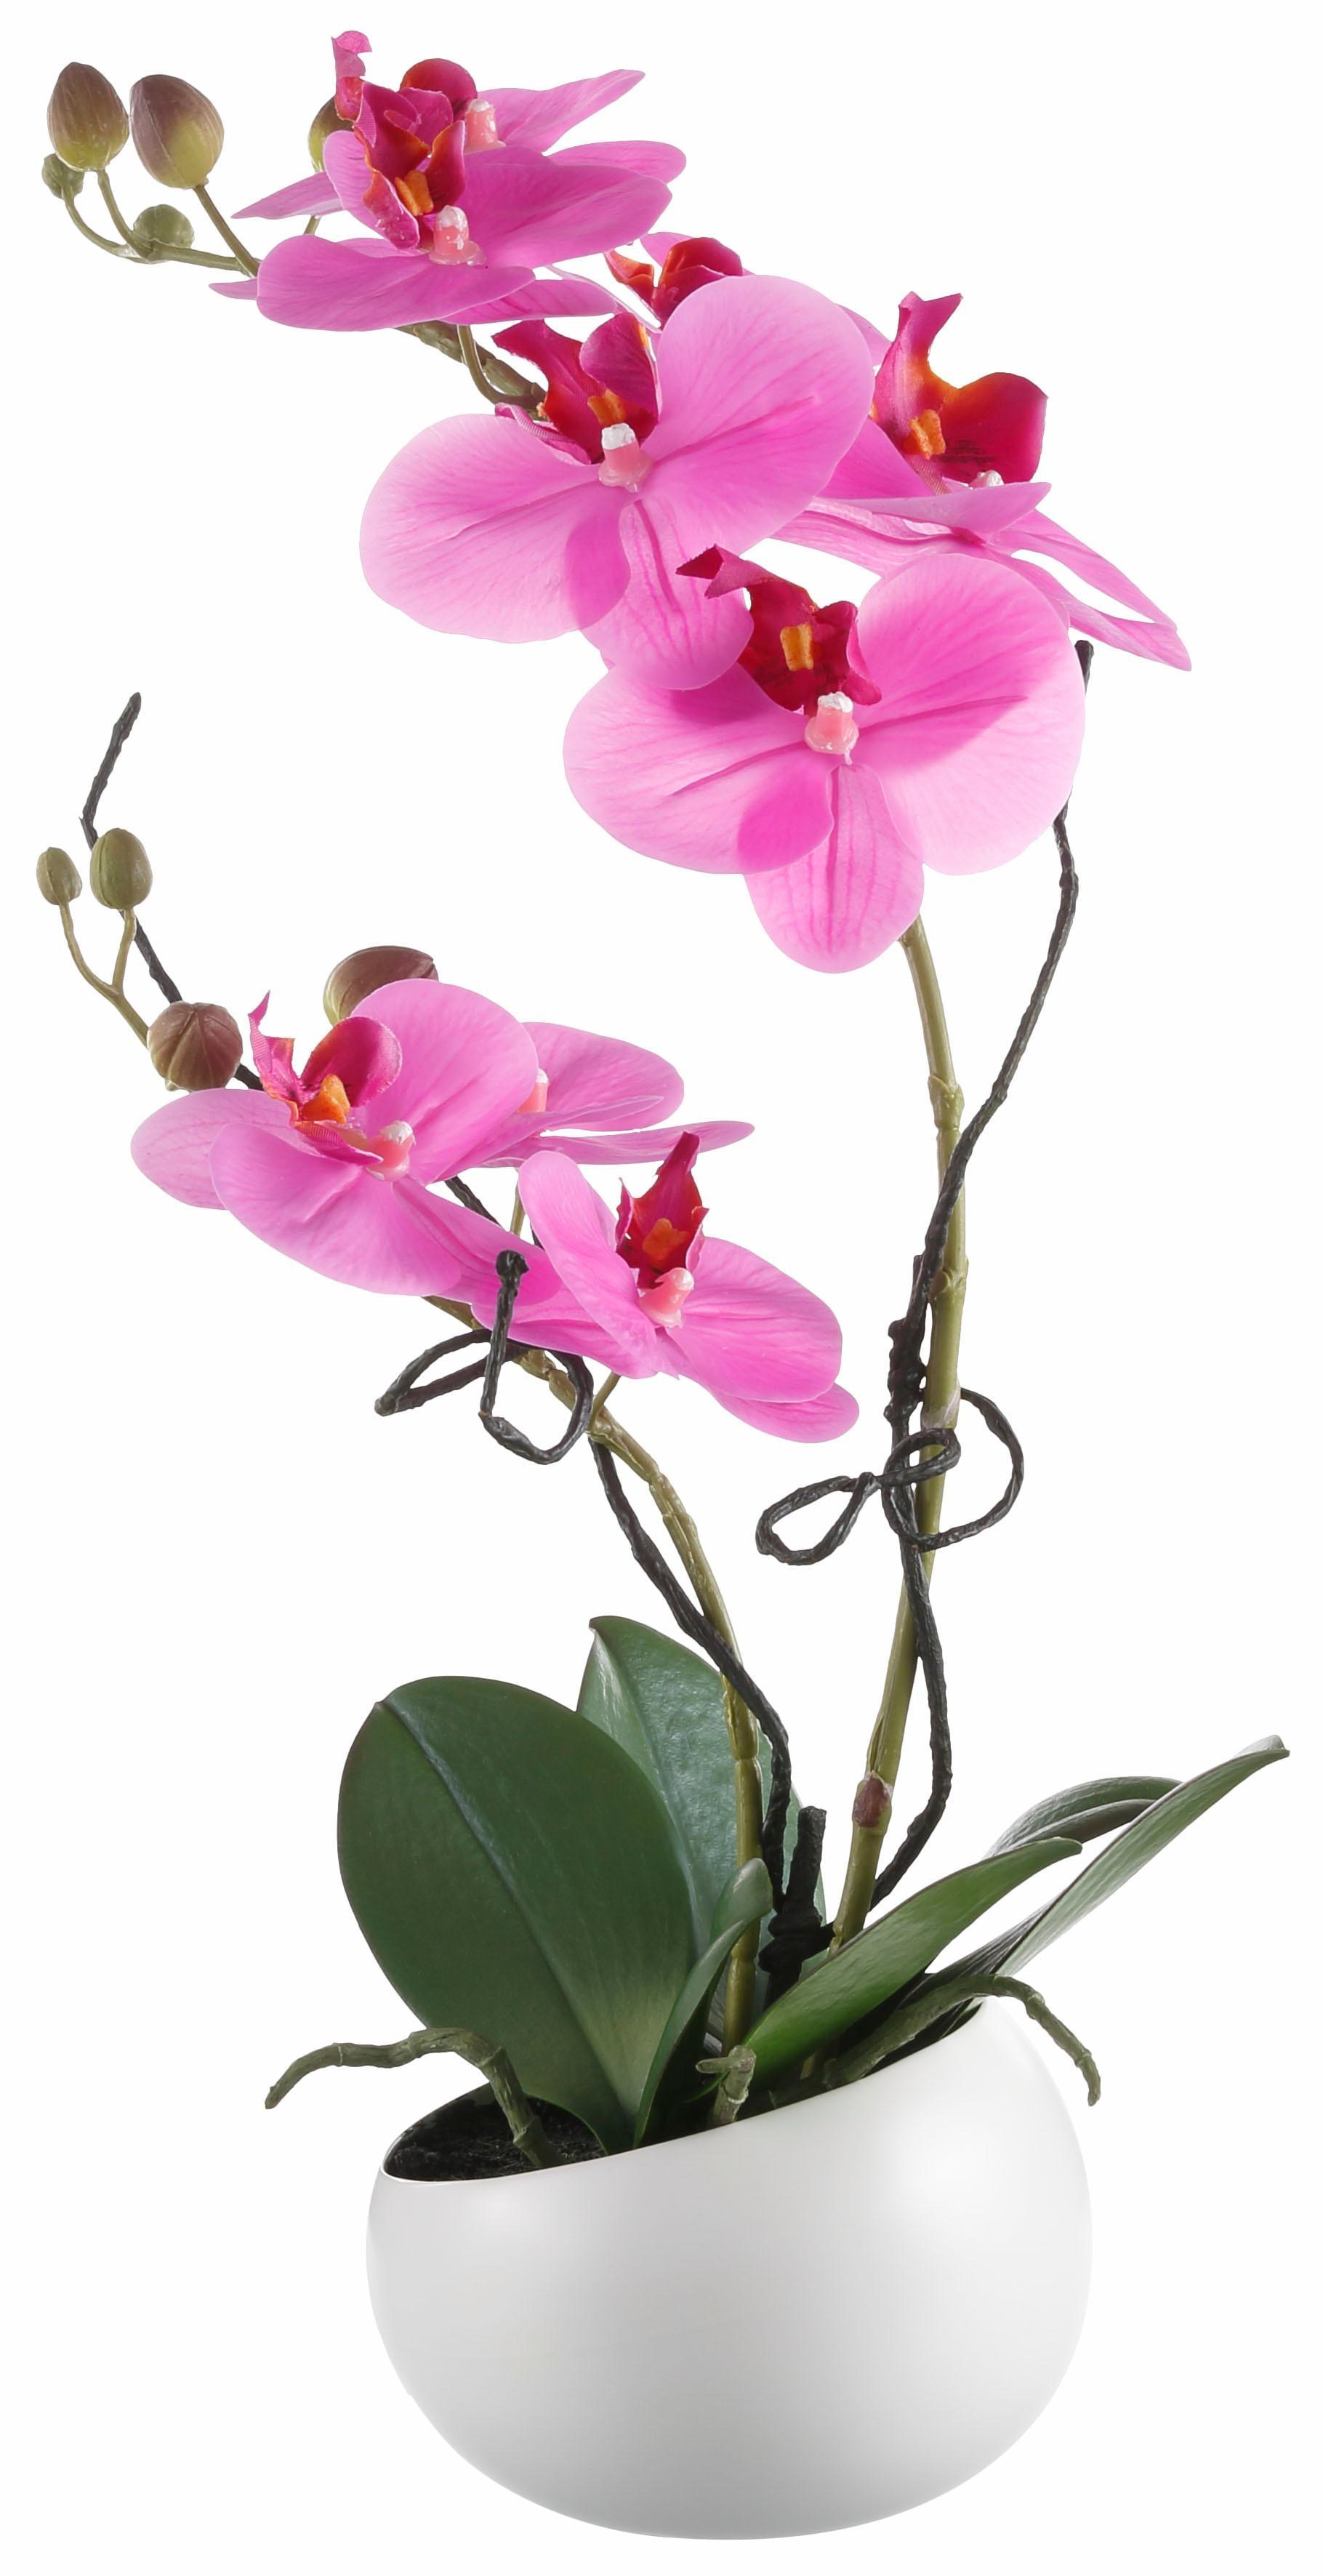 Kunstorchidee Orchidee Technik & Freizeit/Heimwerken & Garten/Garten & Balkon/Pflanzen/Kunstpflanzen/Kunst-Orchideen